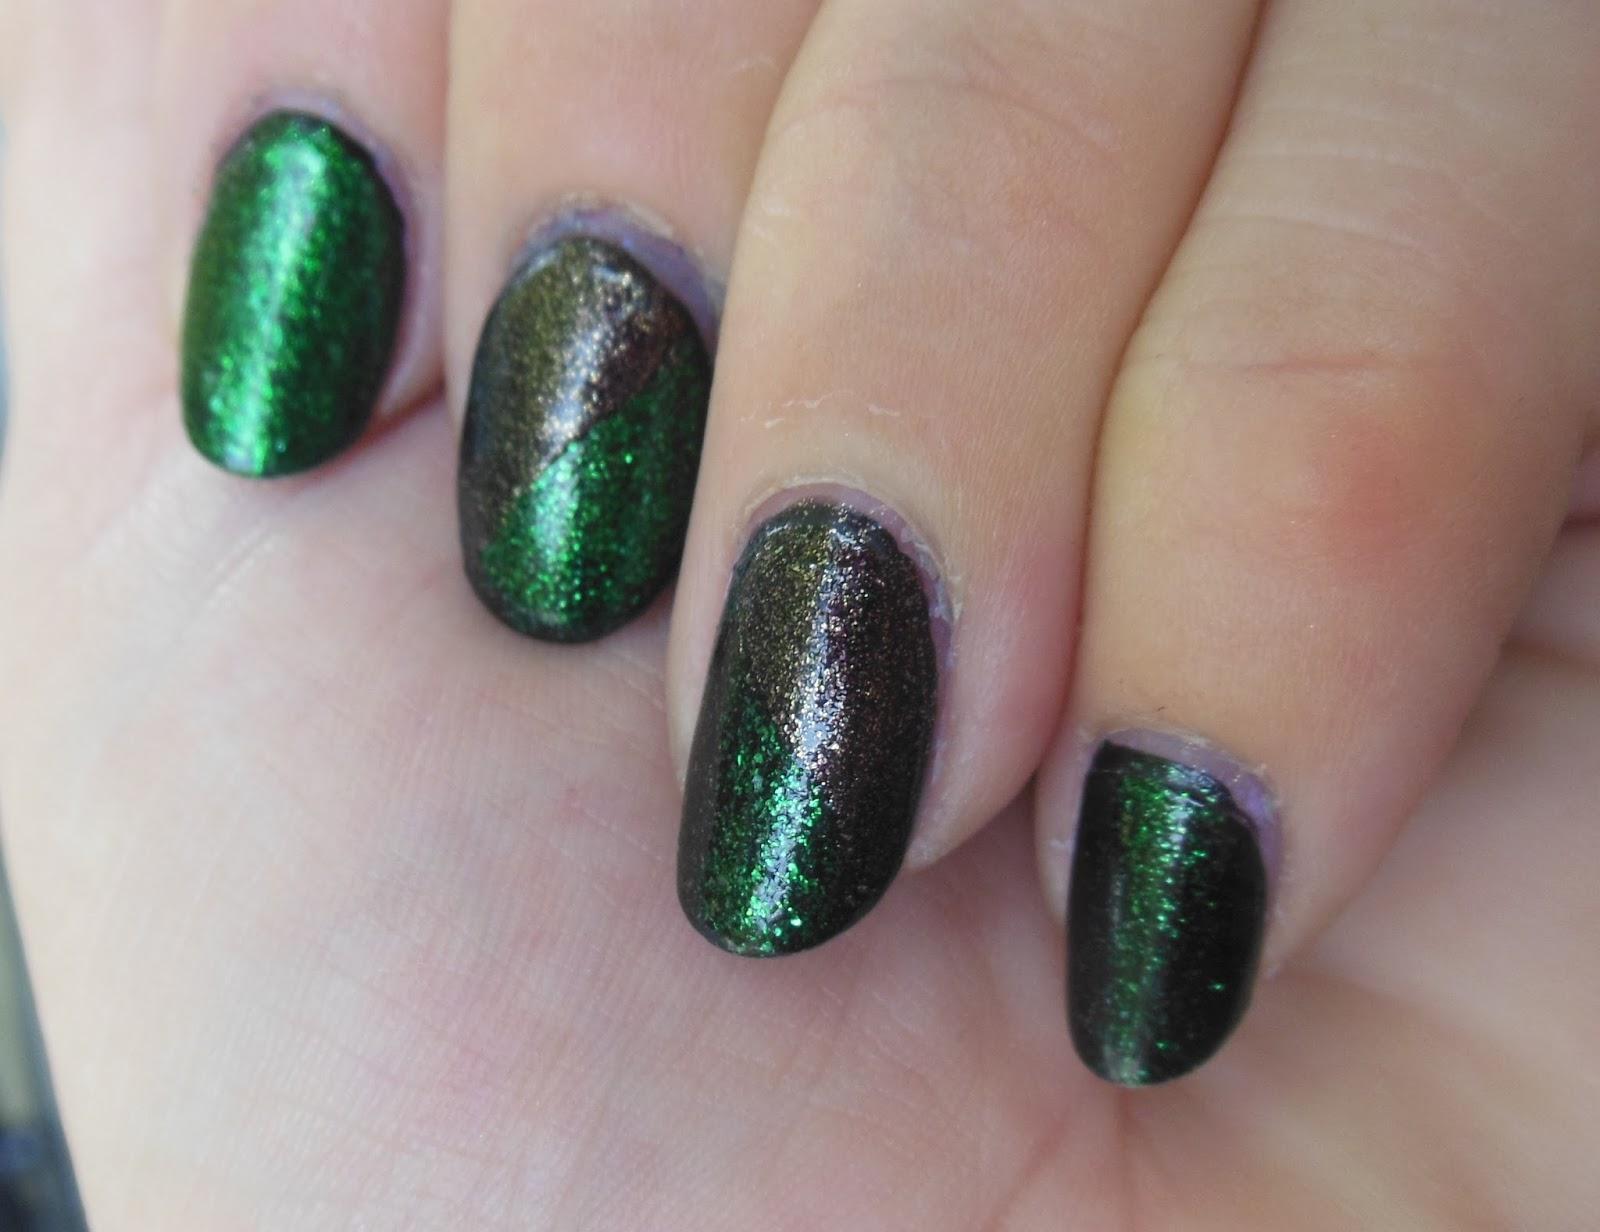 Nails: NOTW Julep\'s Cher, Shailene over Kleancolor\'s Black nail Polish